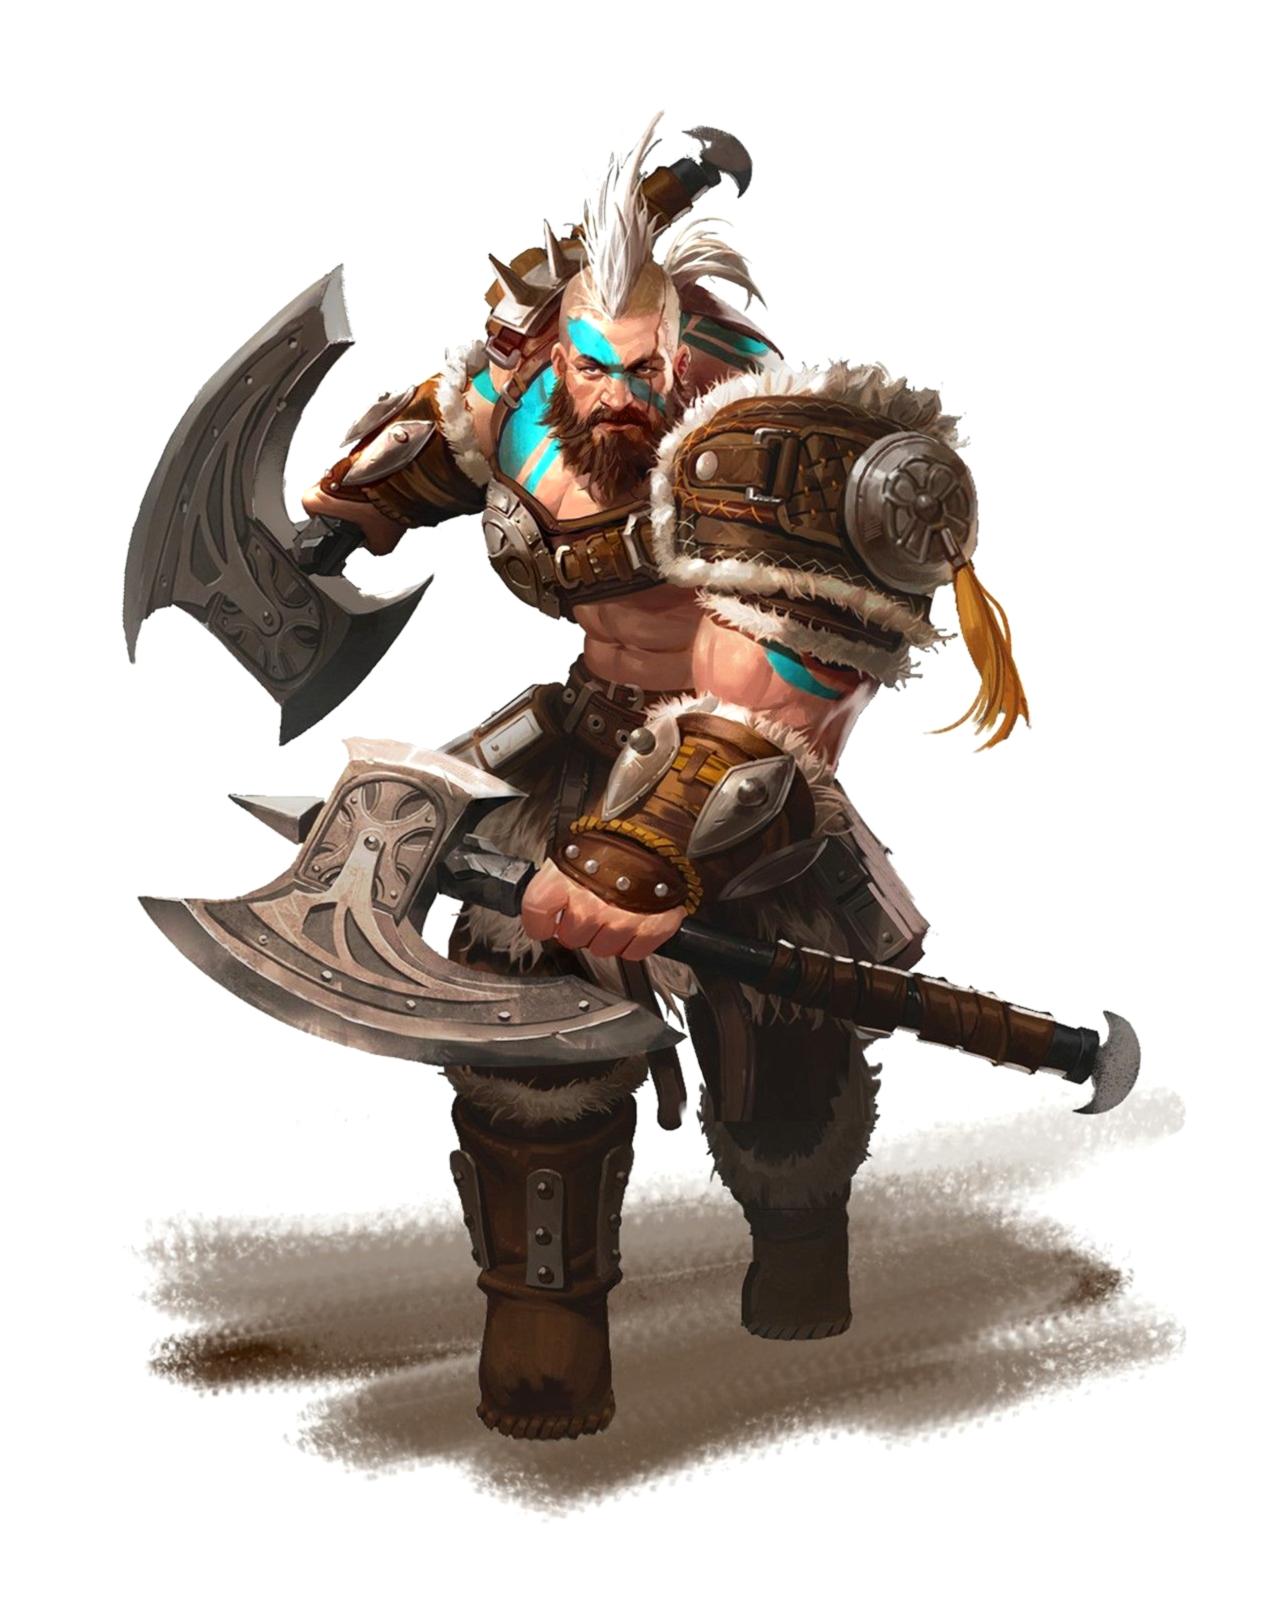 Male Human Barbarian Berserk Dual Axe wielding - Pathfinder